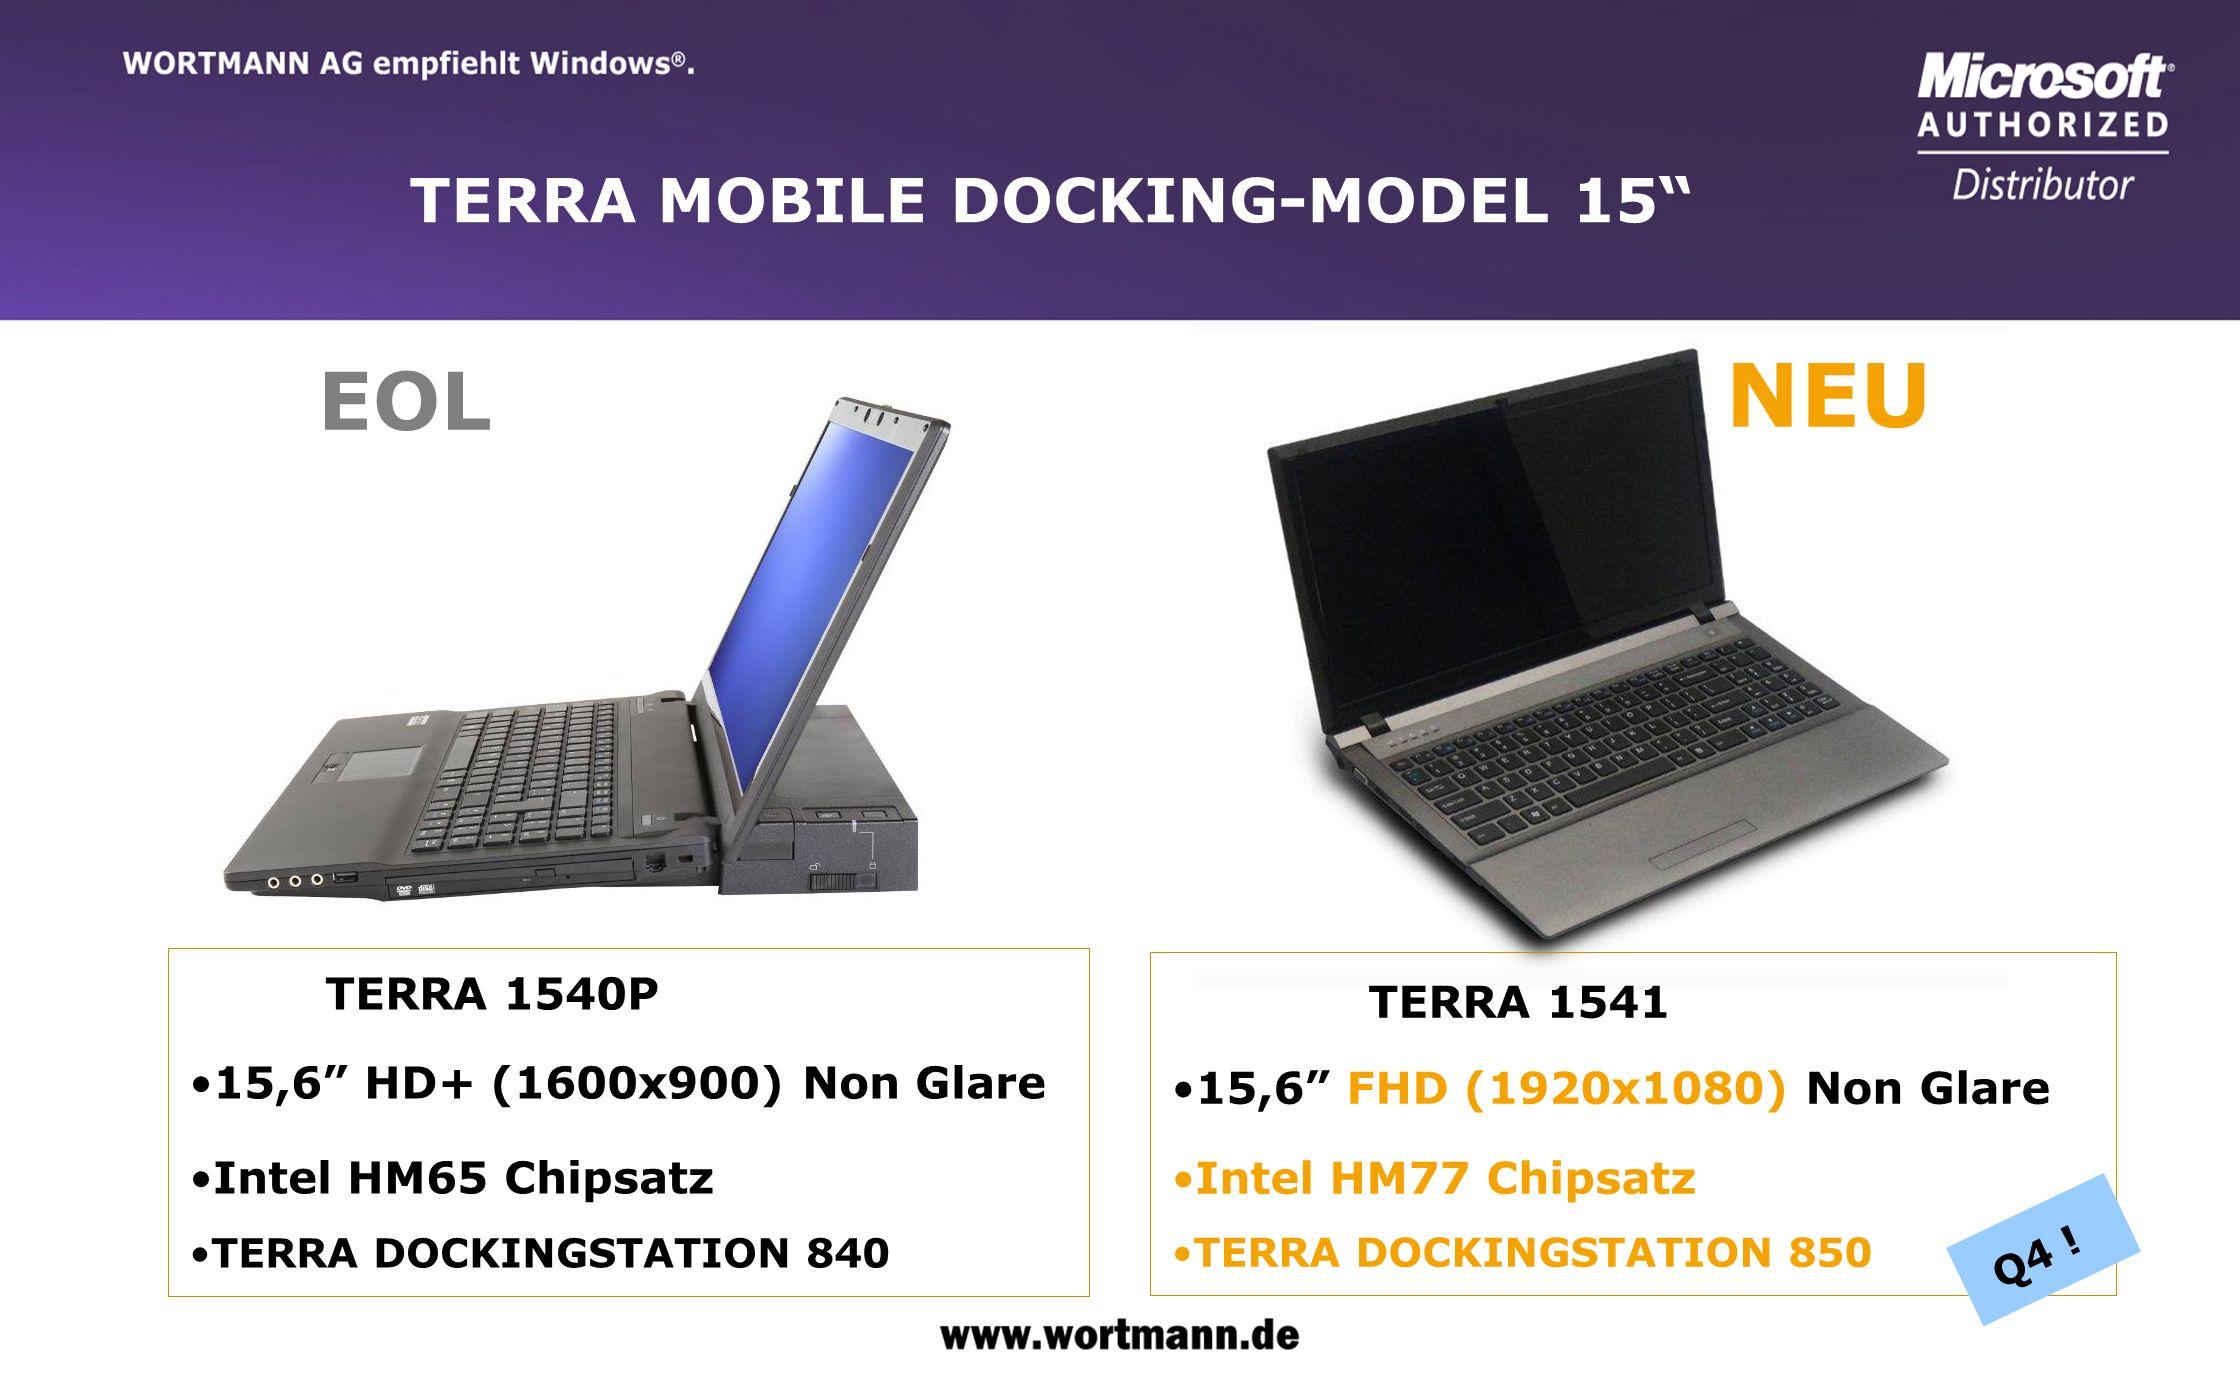 www.wortmann.de TERRA MOBILE DOCKING-MODEL 15 TERRA 1540P 15,6 HD+ (1600x900) Non Glare Intel HM65 Chipsatz TERRA DOCKINGSTATION 840 TERRA 1541 15,6 F